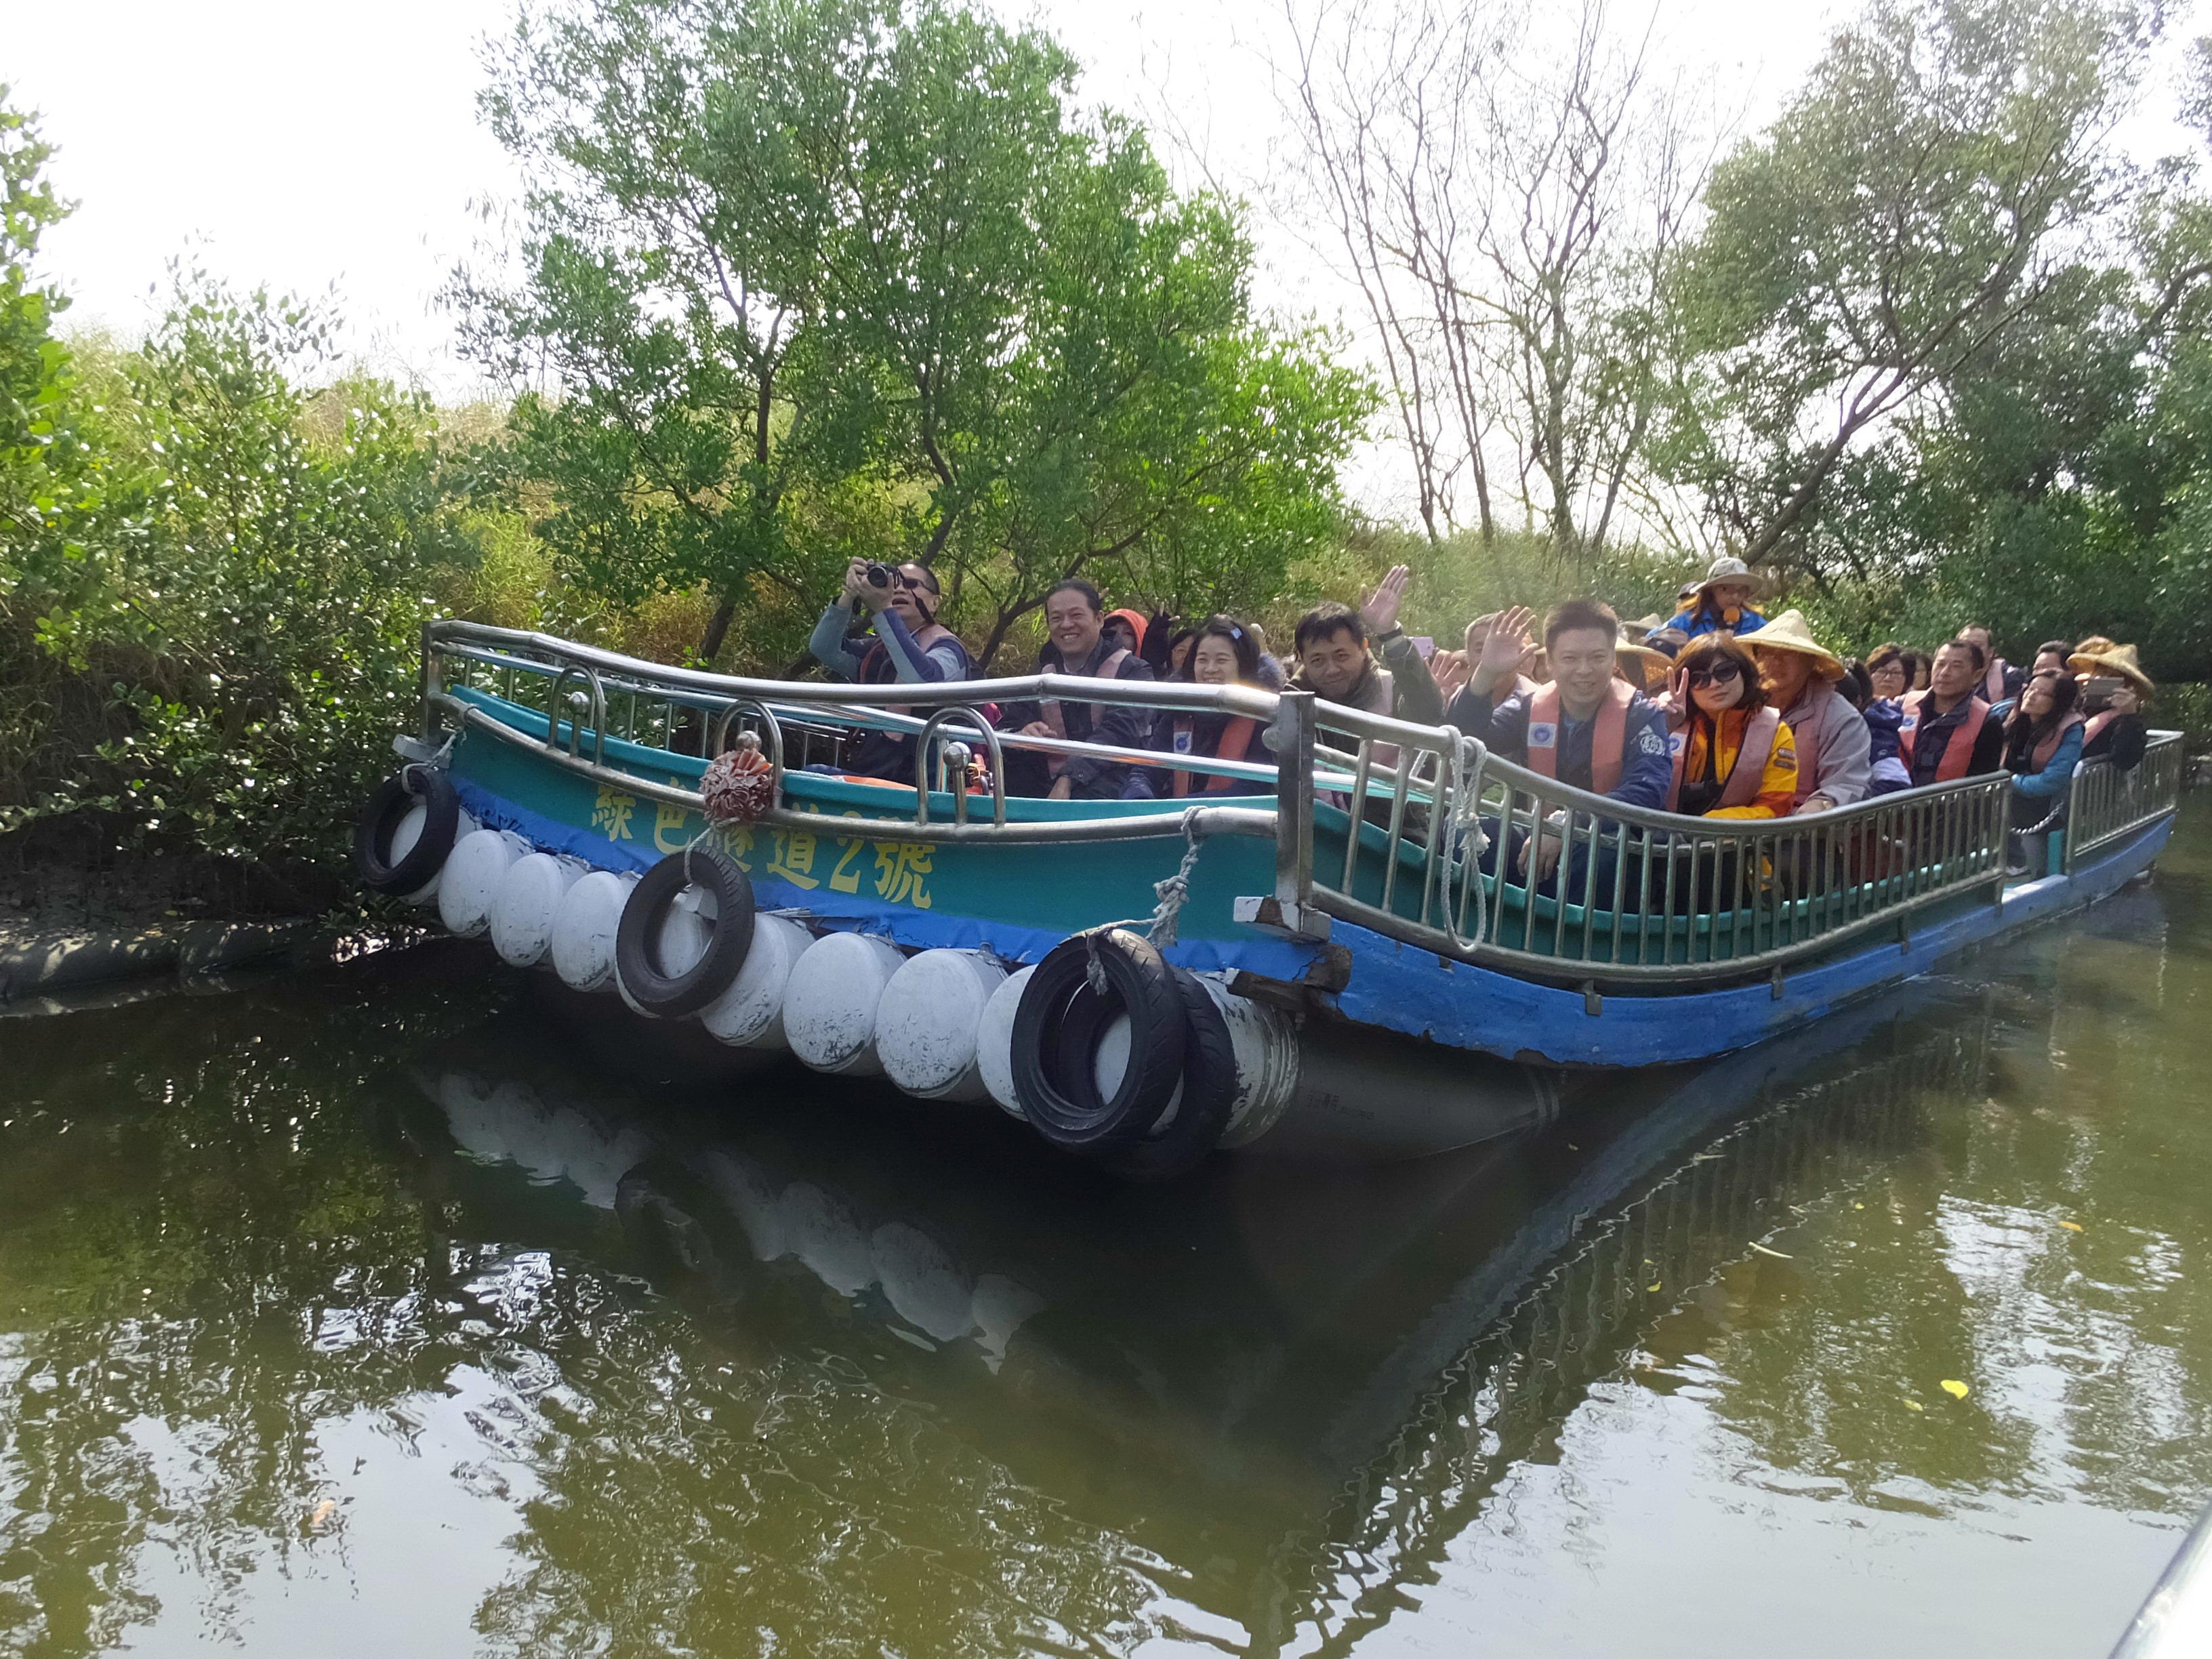 File:PVC Pipe Raft 膠筏 - panoramio jpg - Wikimedia Commons